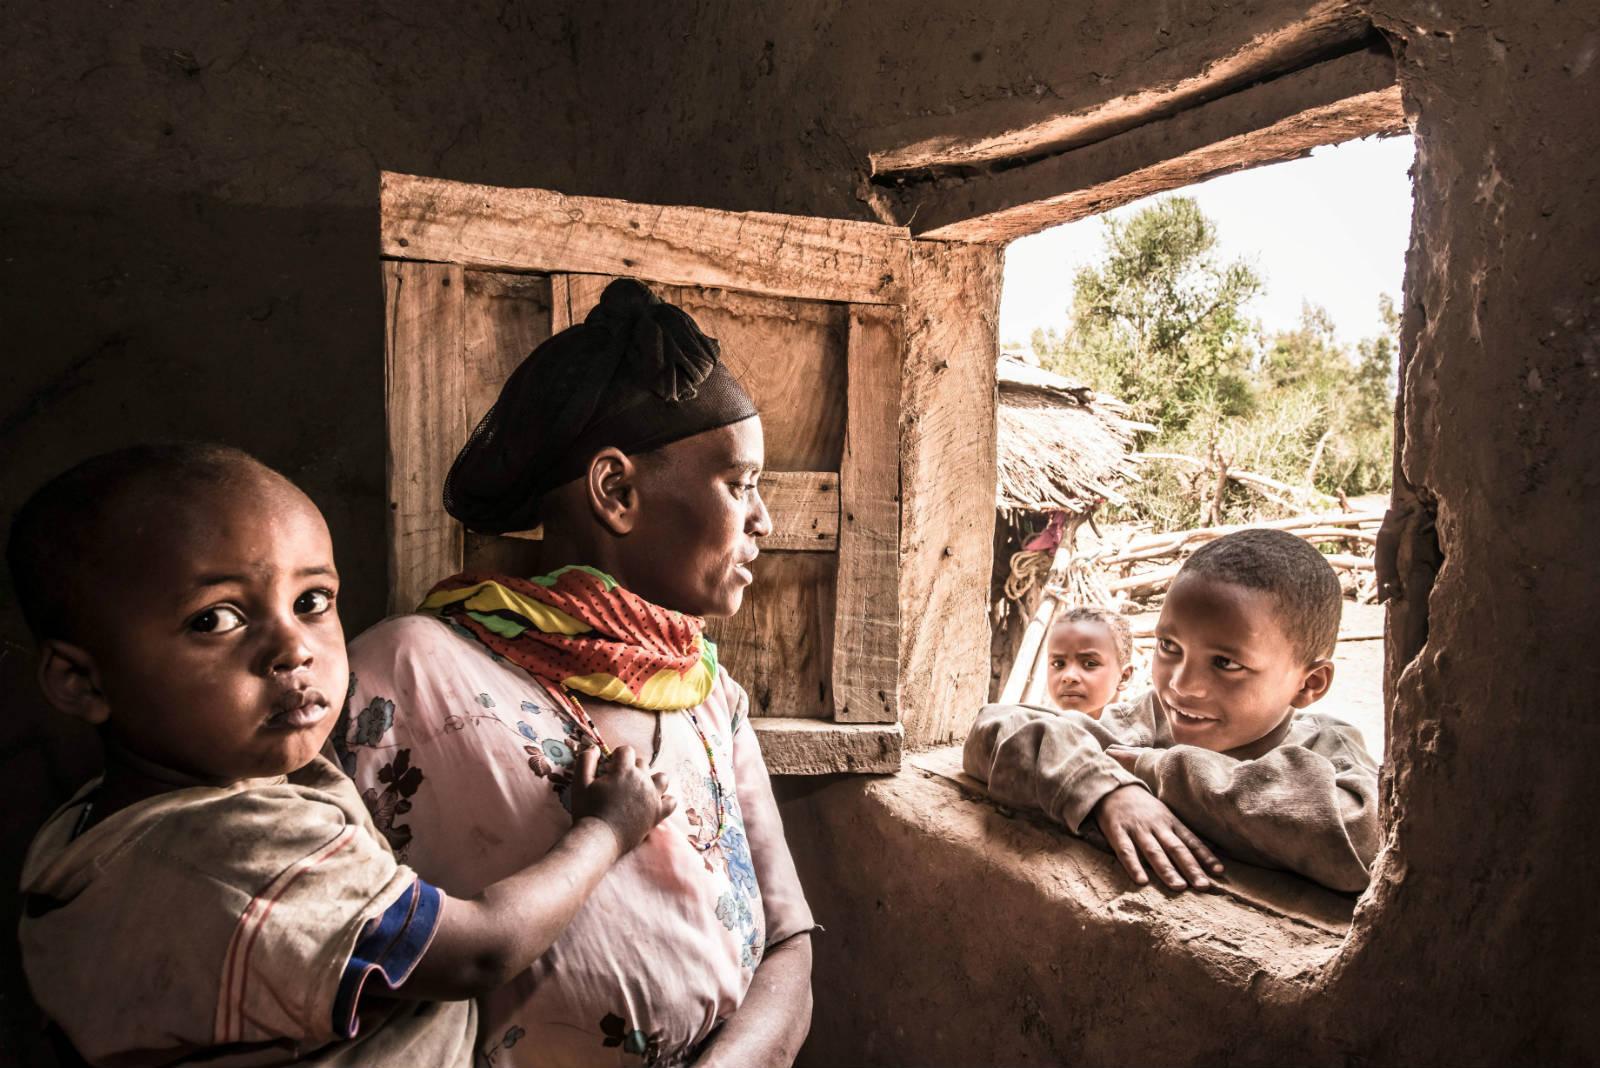 Fatuma 參加了樂施會舉辦的婦女小農互助小組,學習種菜,改善孩子的生活。